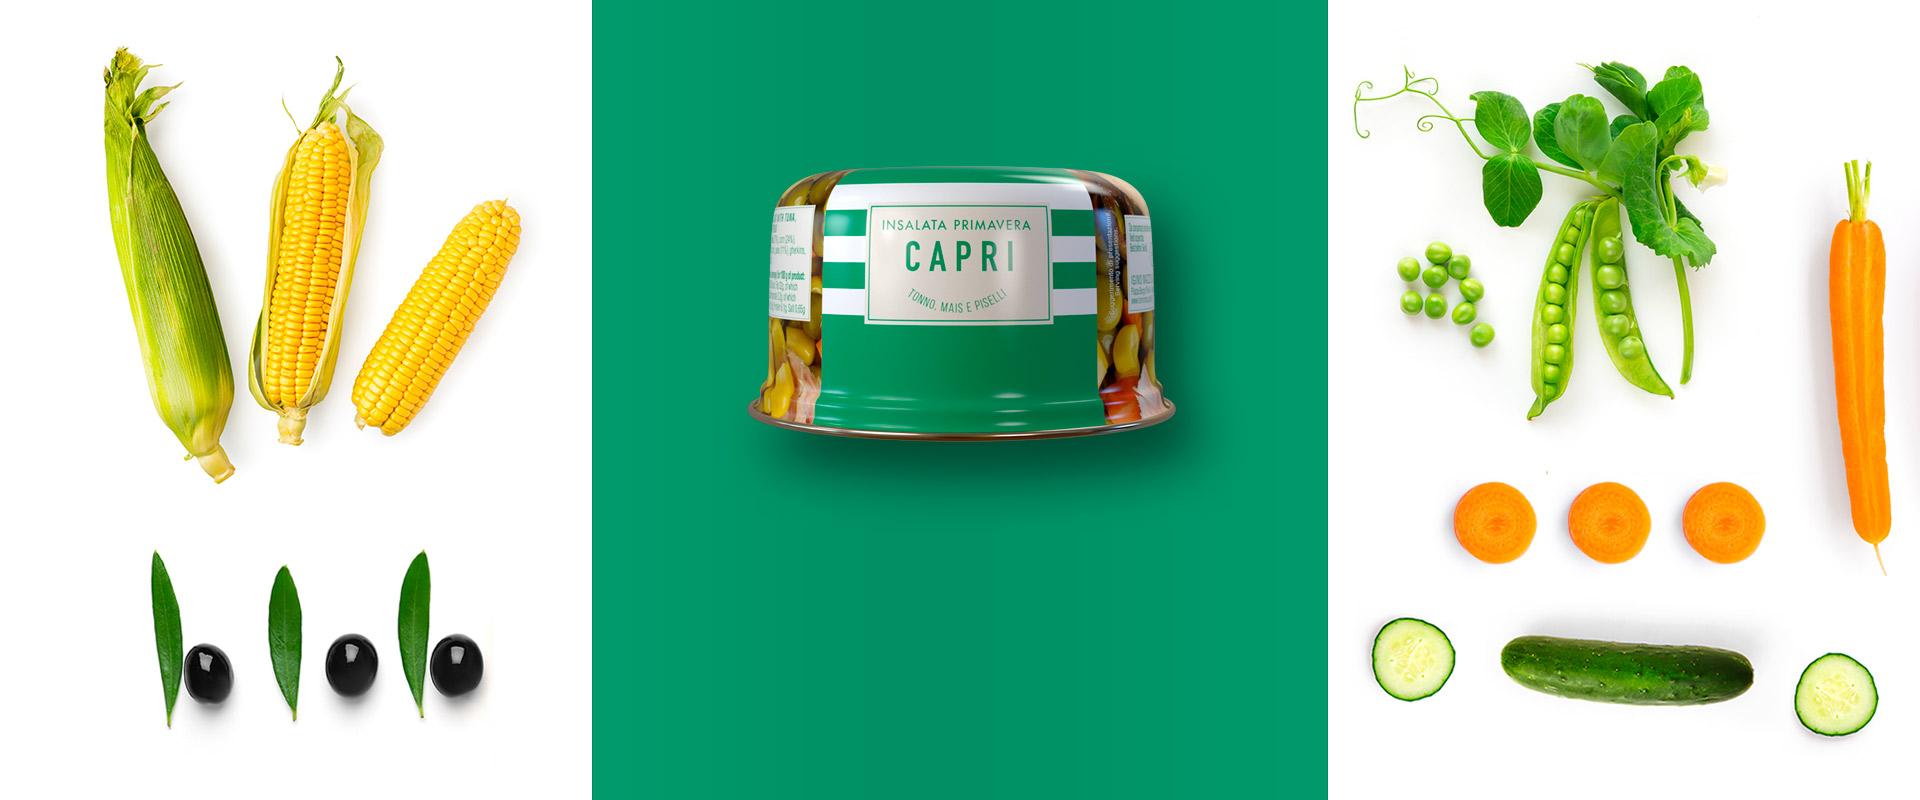 Insalata Capri primavera ricetta